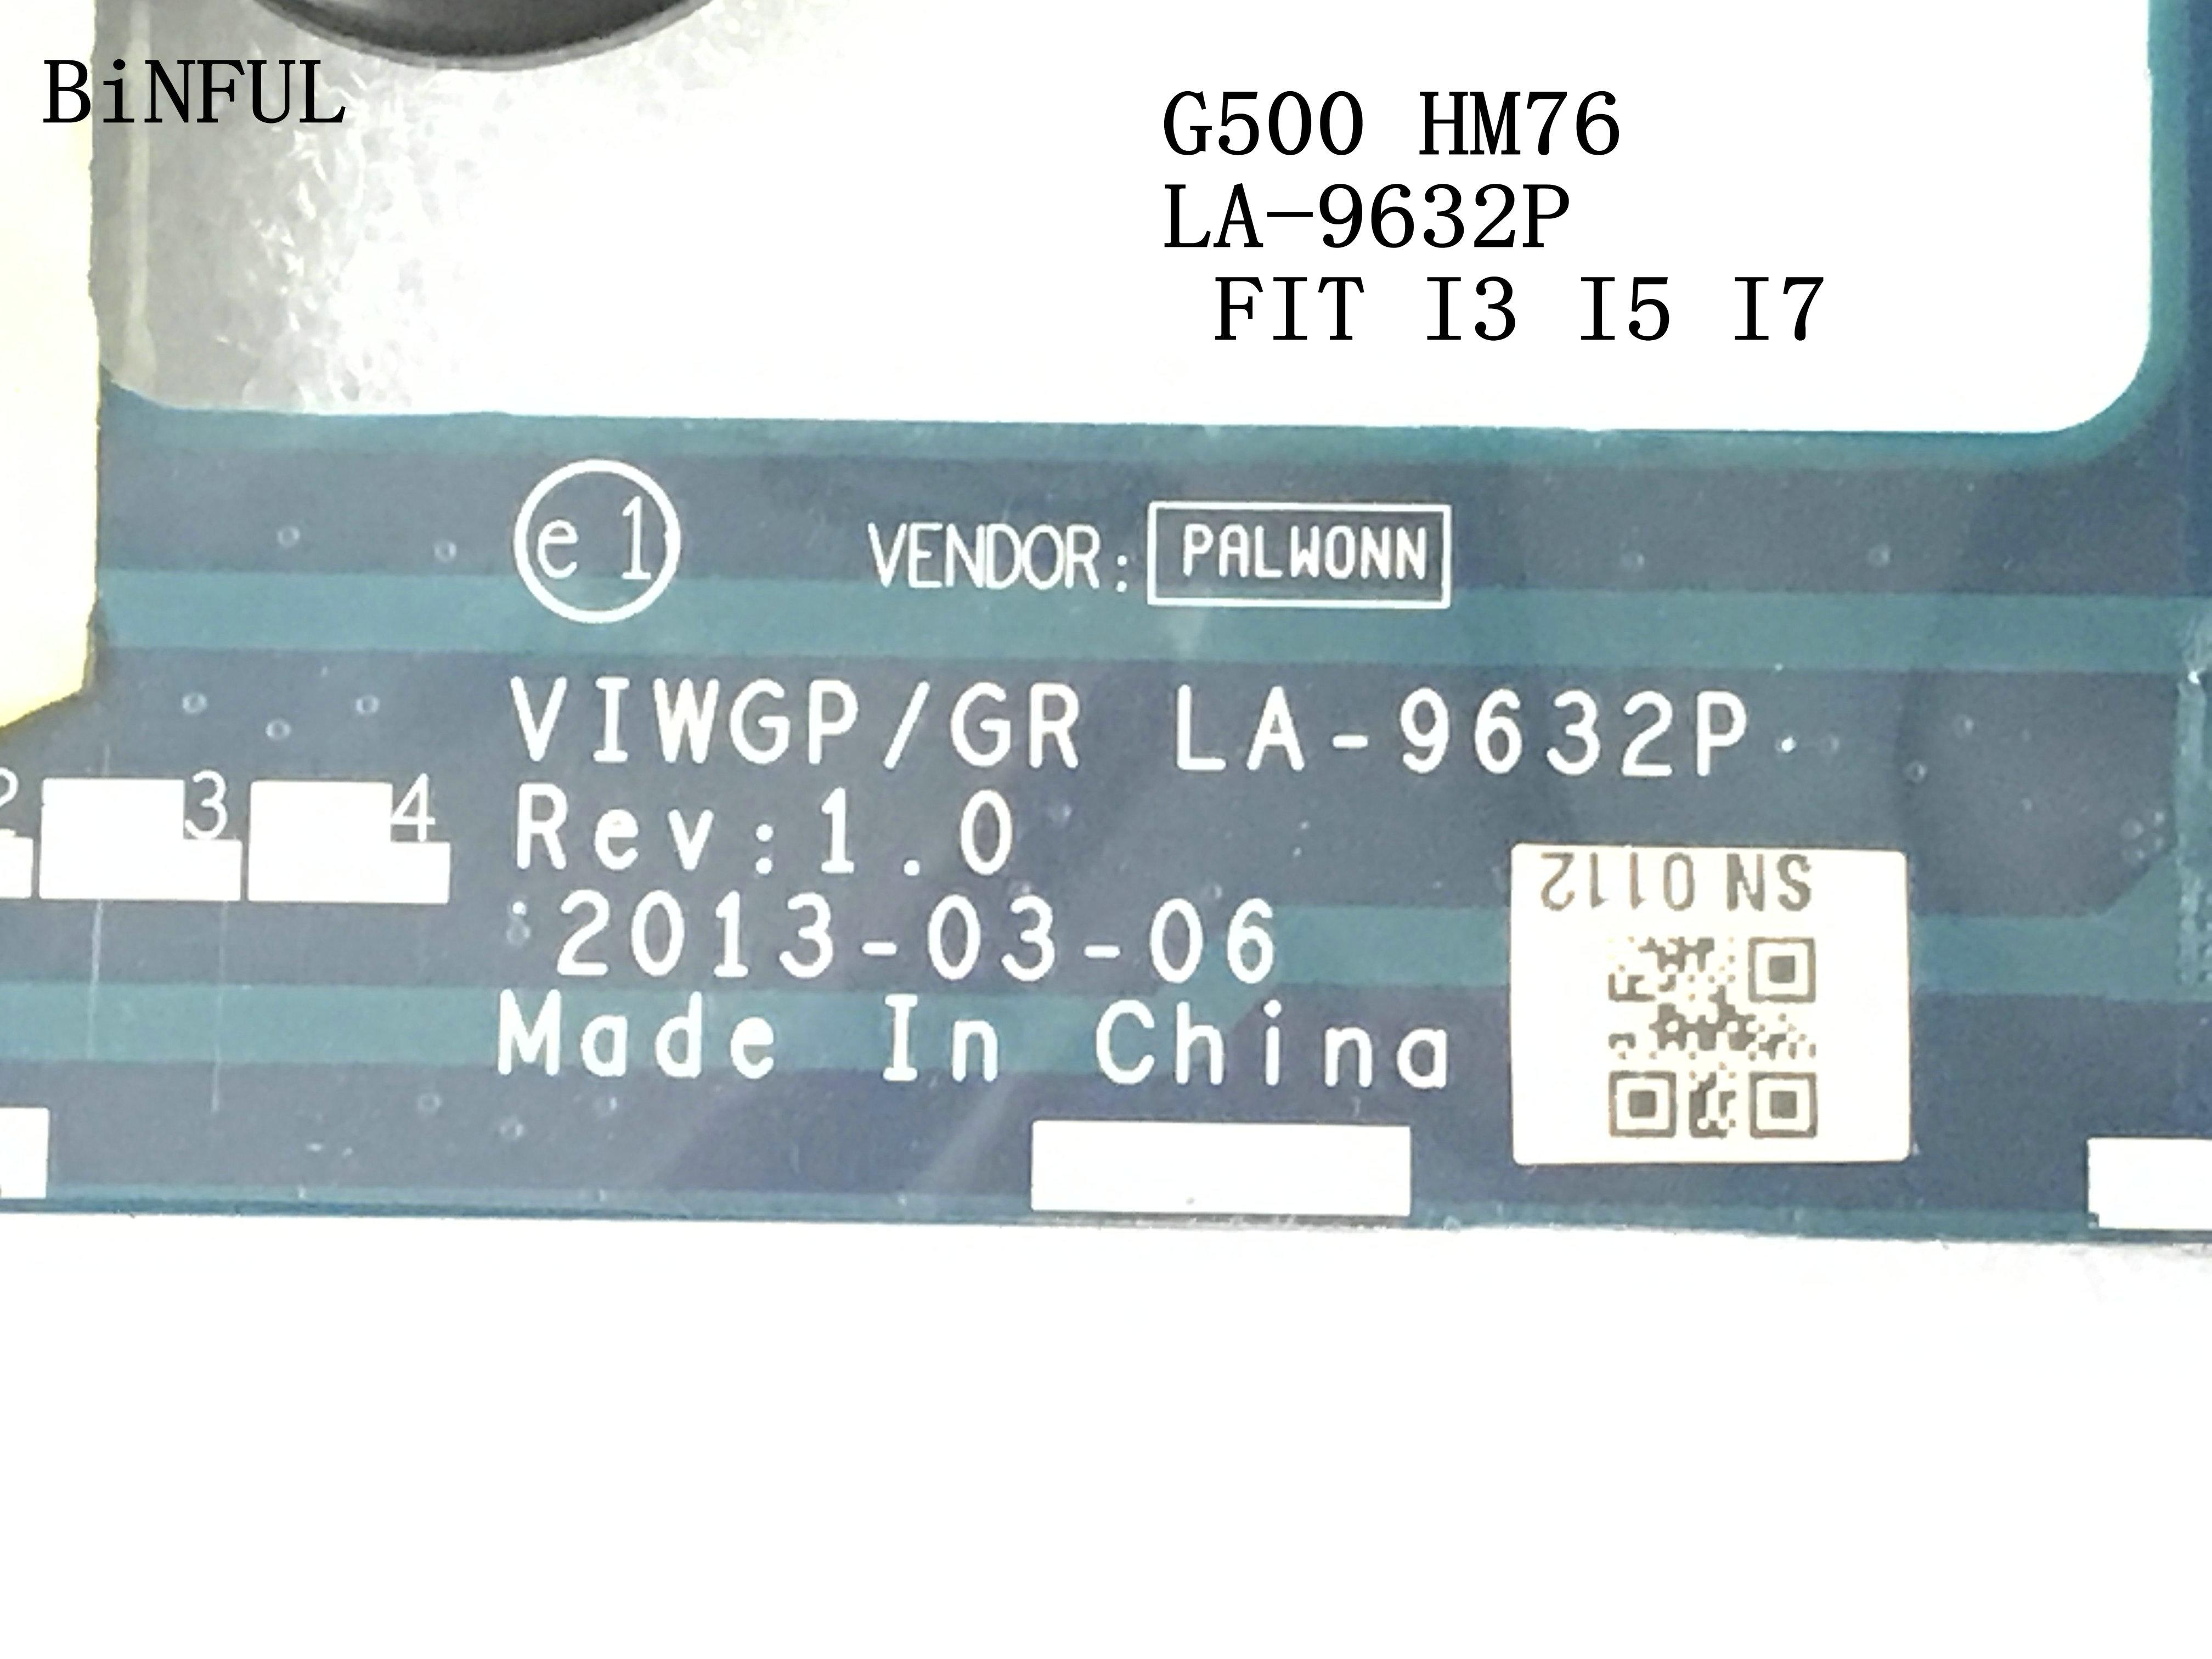 BiNFUL  stock ,VIWGP/GR LA-9632P LAPTOP MOTHERBOARD FOR LENOVO G500 NOTEBOOK PC MAINBOARD, SUPPORT core I3 I5 I7 (TEST OK )